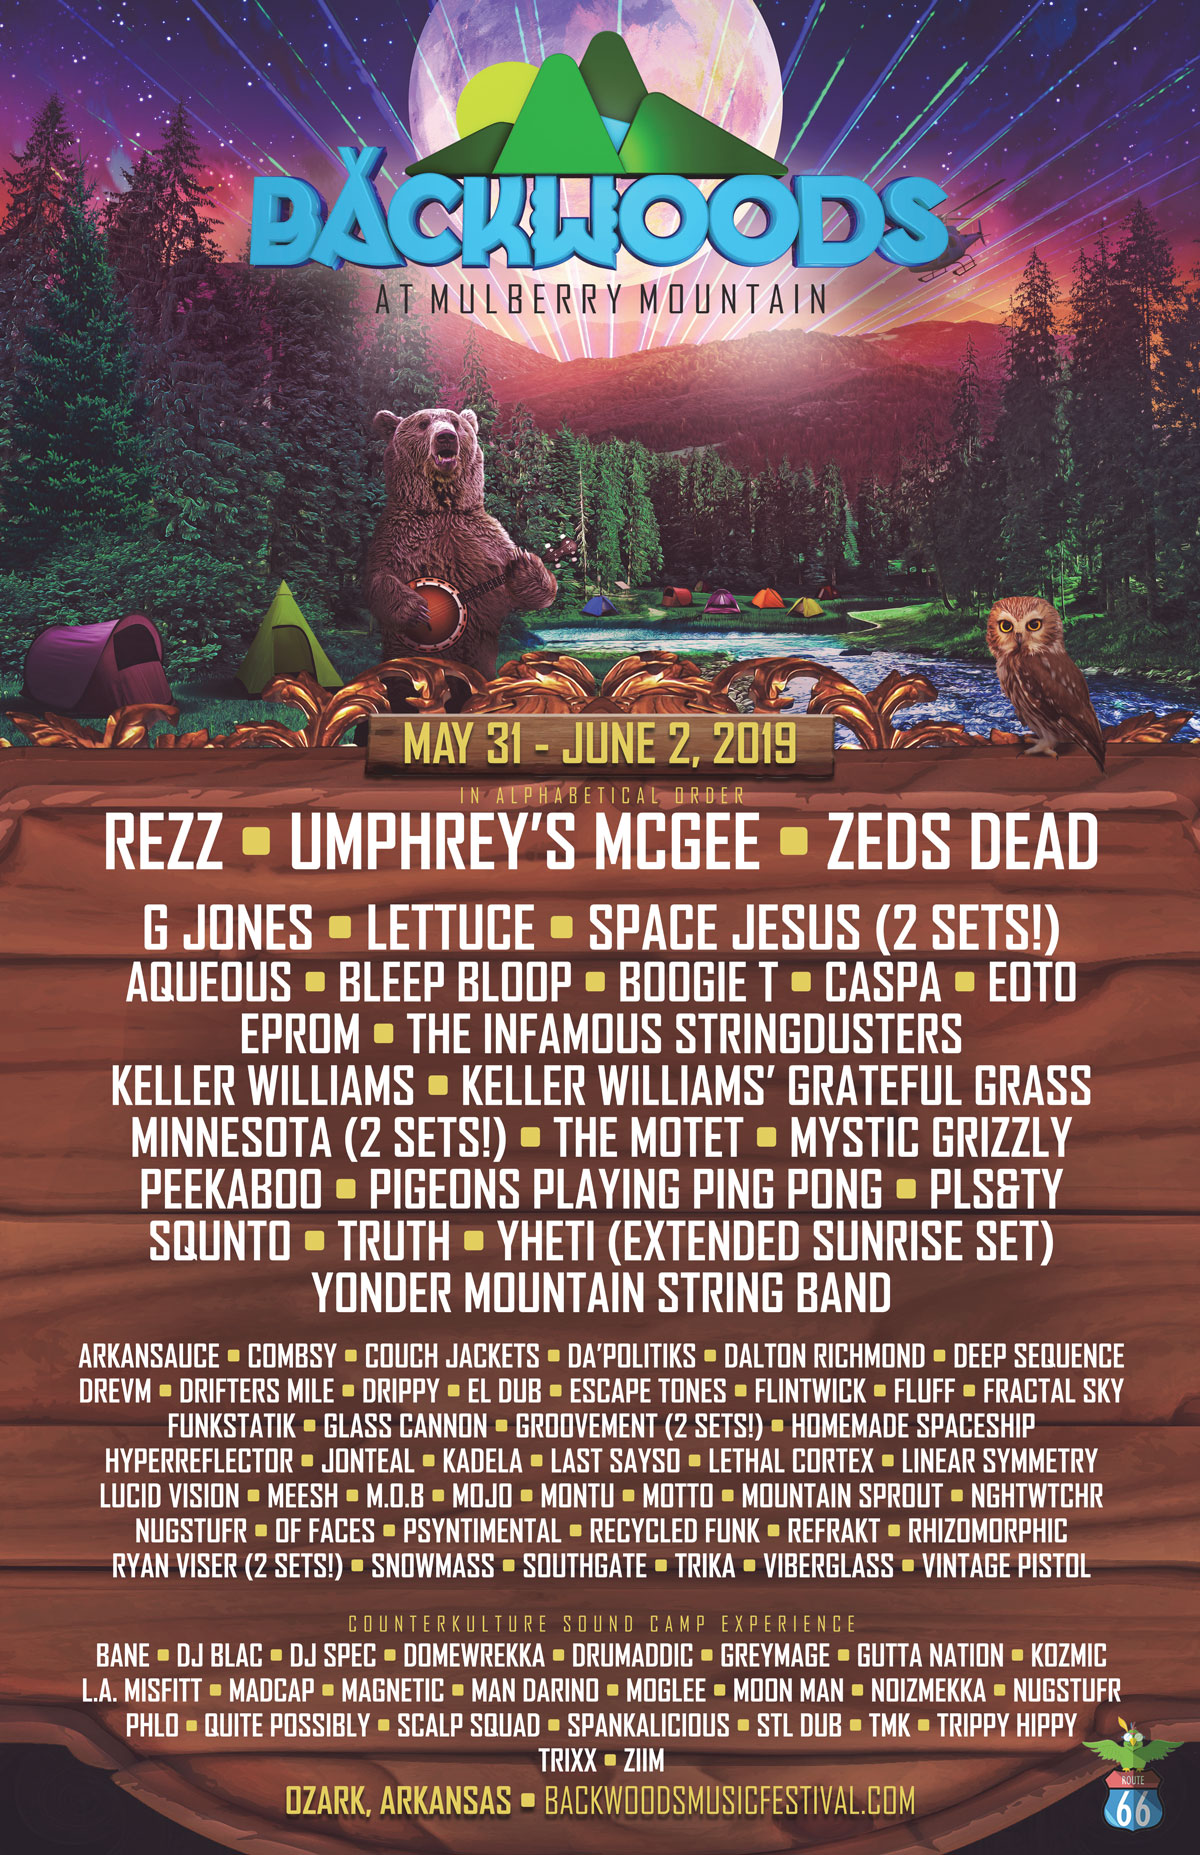 Backwoods 2019 Complete Lineup!